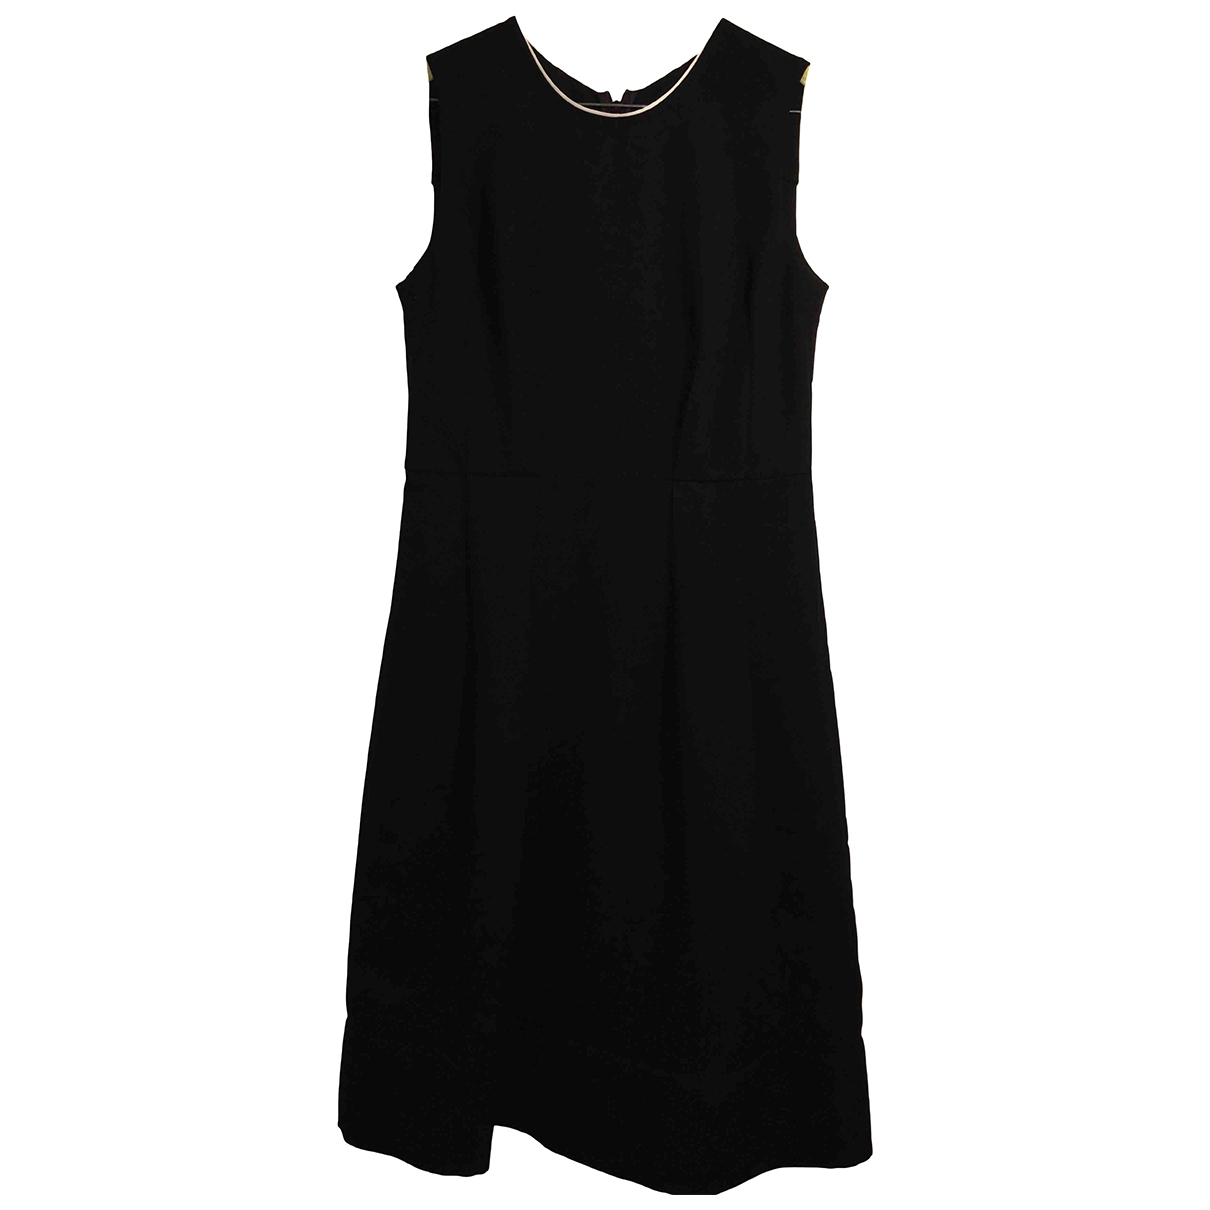 Marni \N Kleid in  Schwarz Polyester